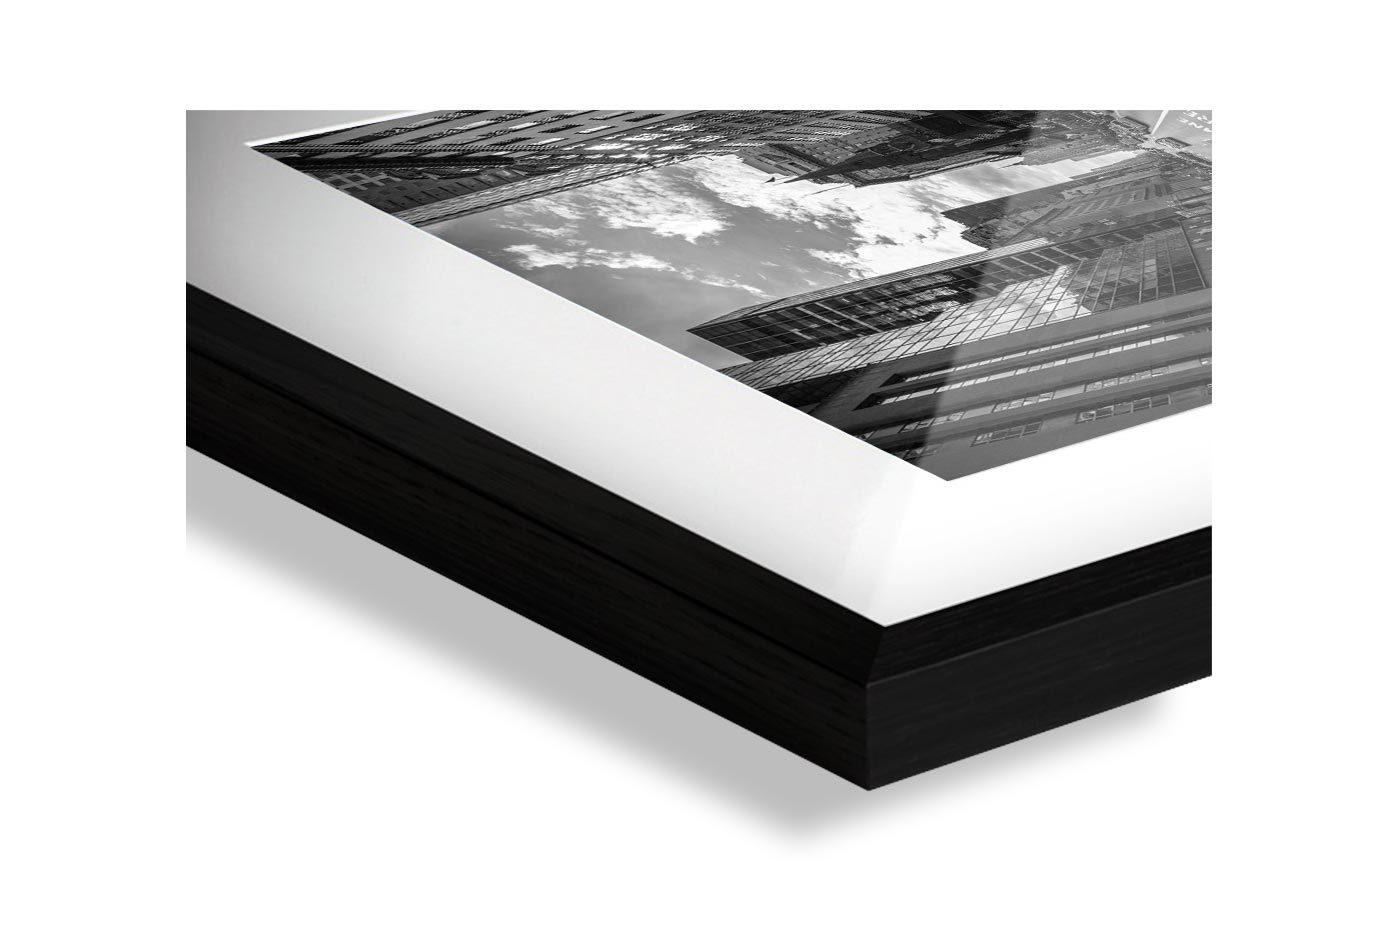 Profil cadre galerie Cloverfield